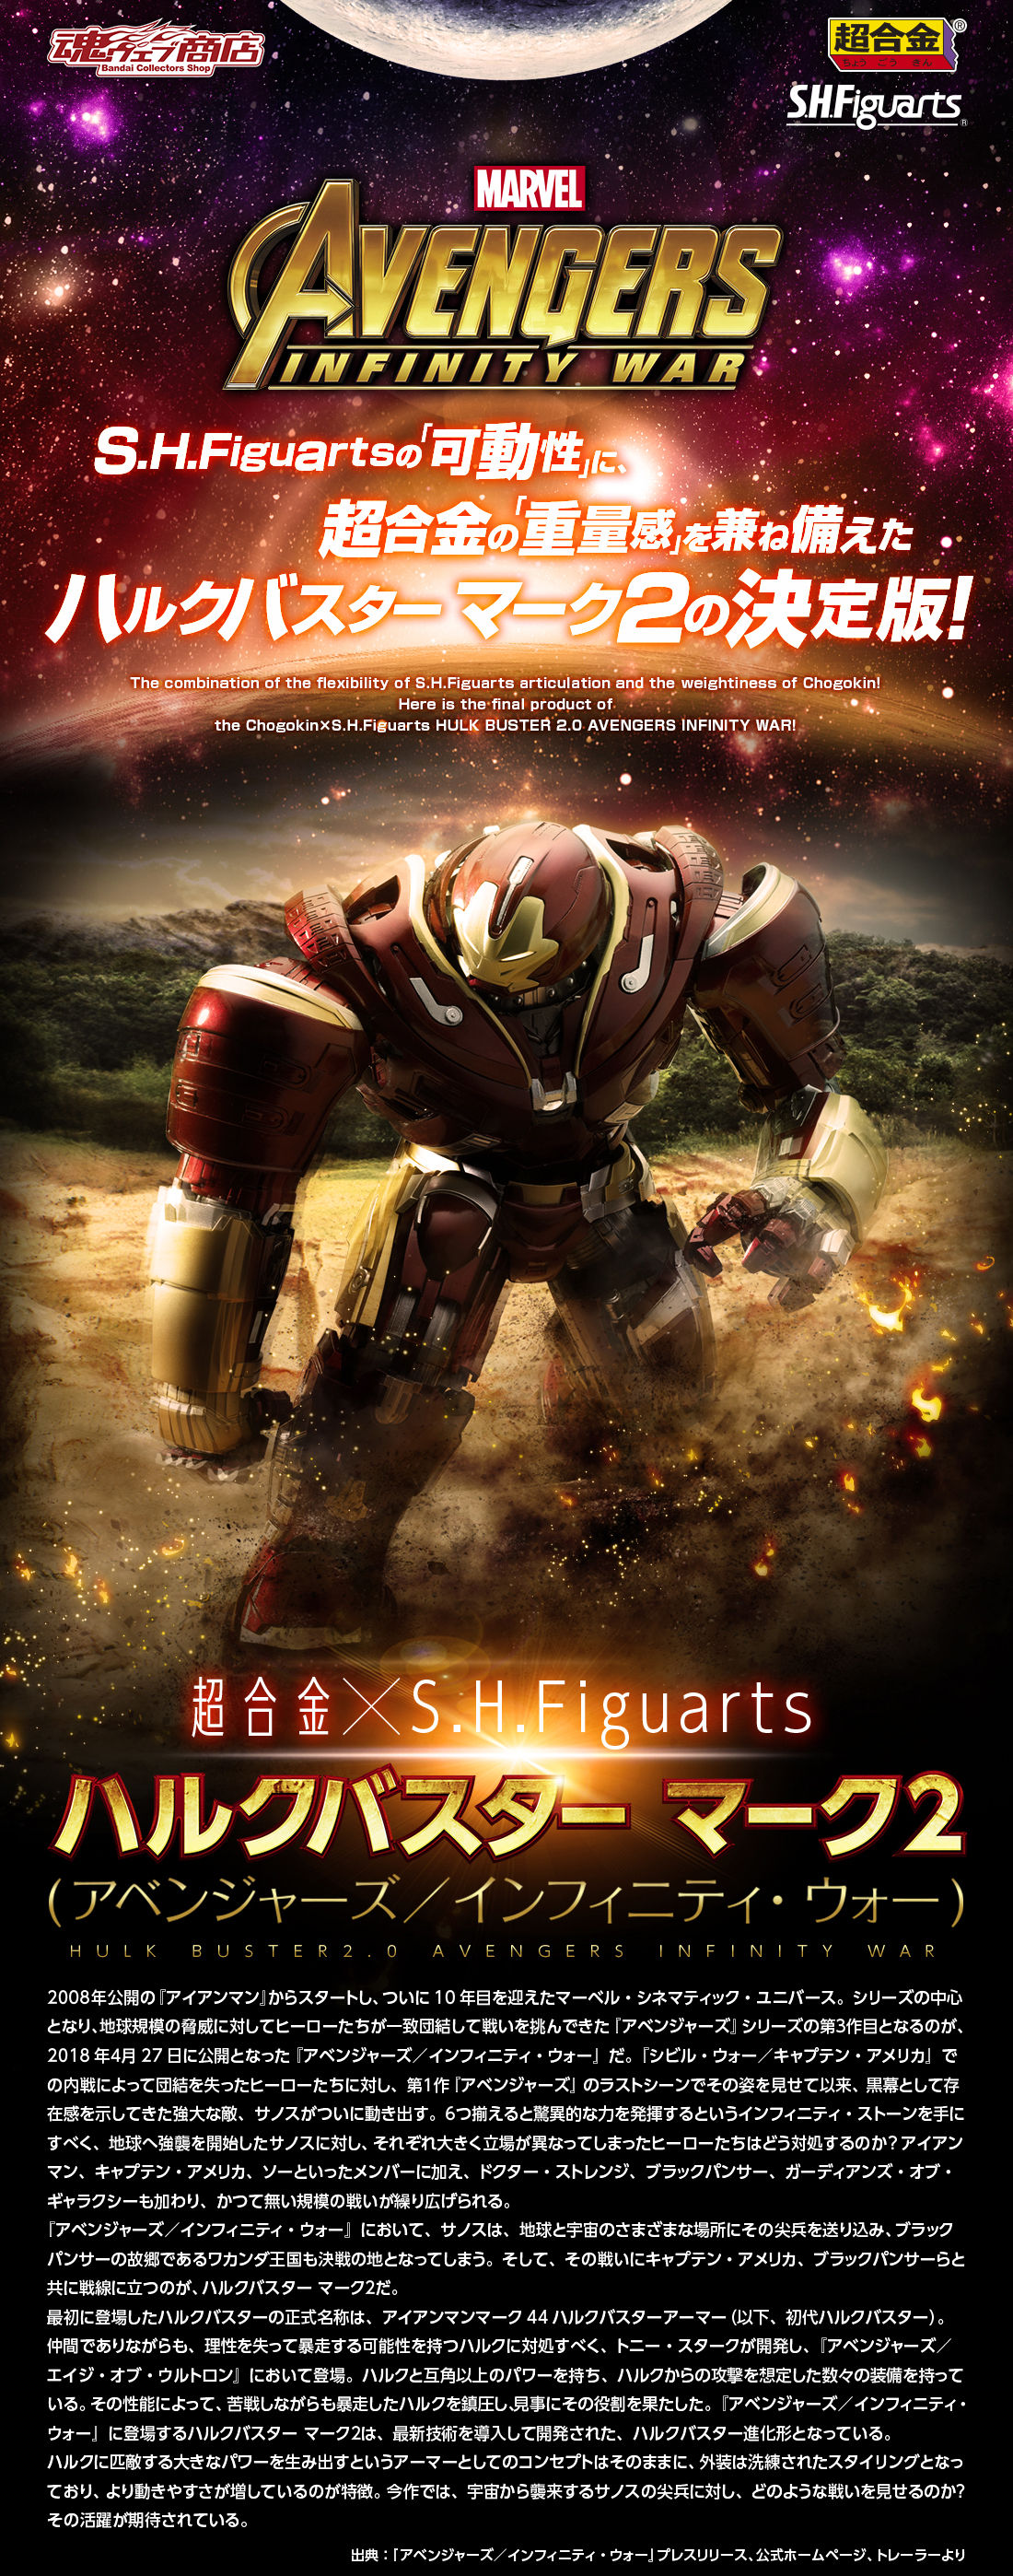 超合金 X S.H.FIGUARTS HULKBUSTER MARK 2 (复仇者/无限战争)